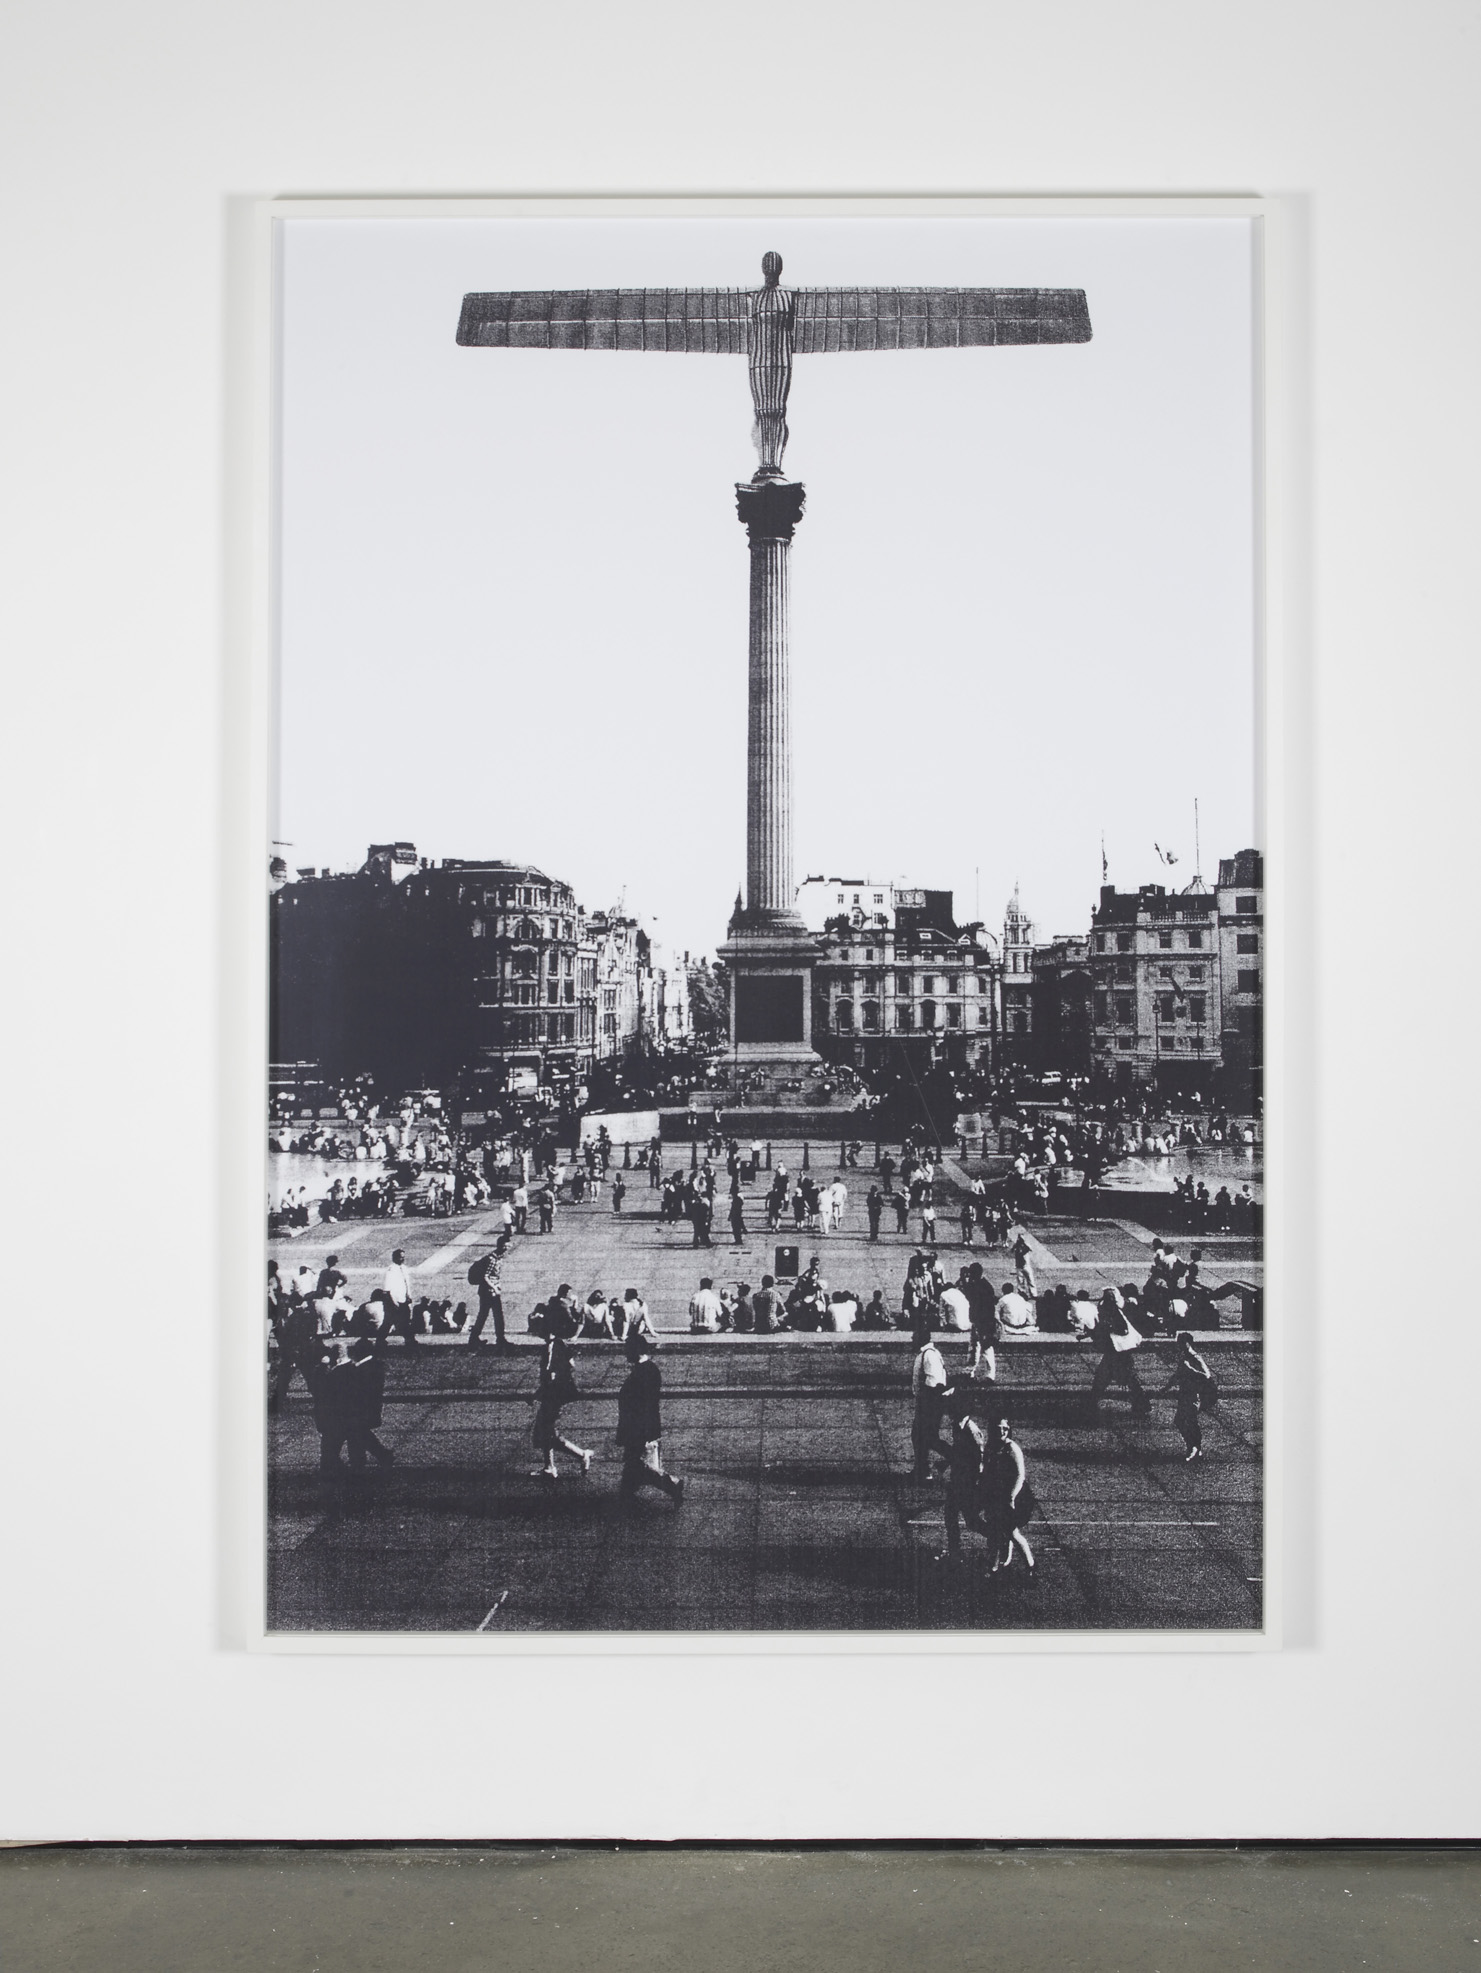 Long Live Death  2012  Inkjet print  109.5 x 75 cm / 43.1 x 29.5 in